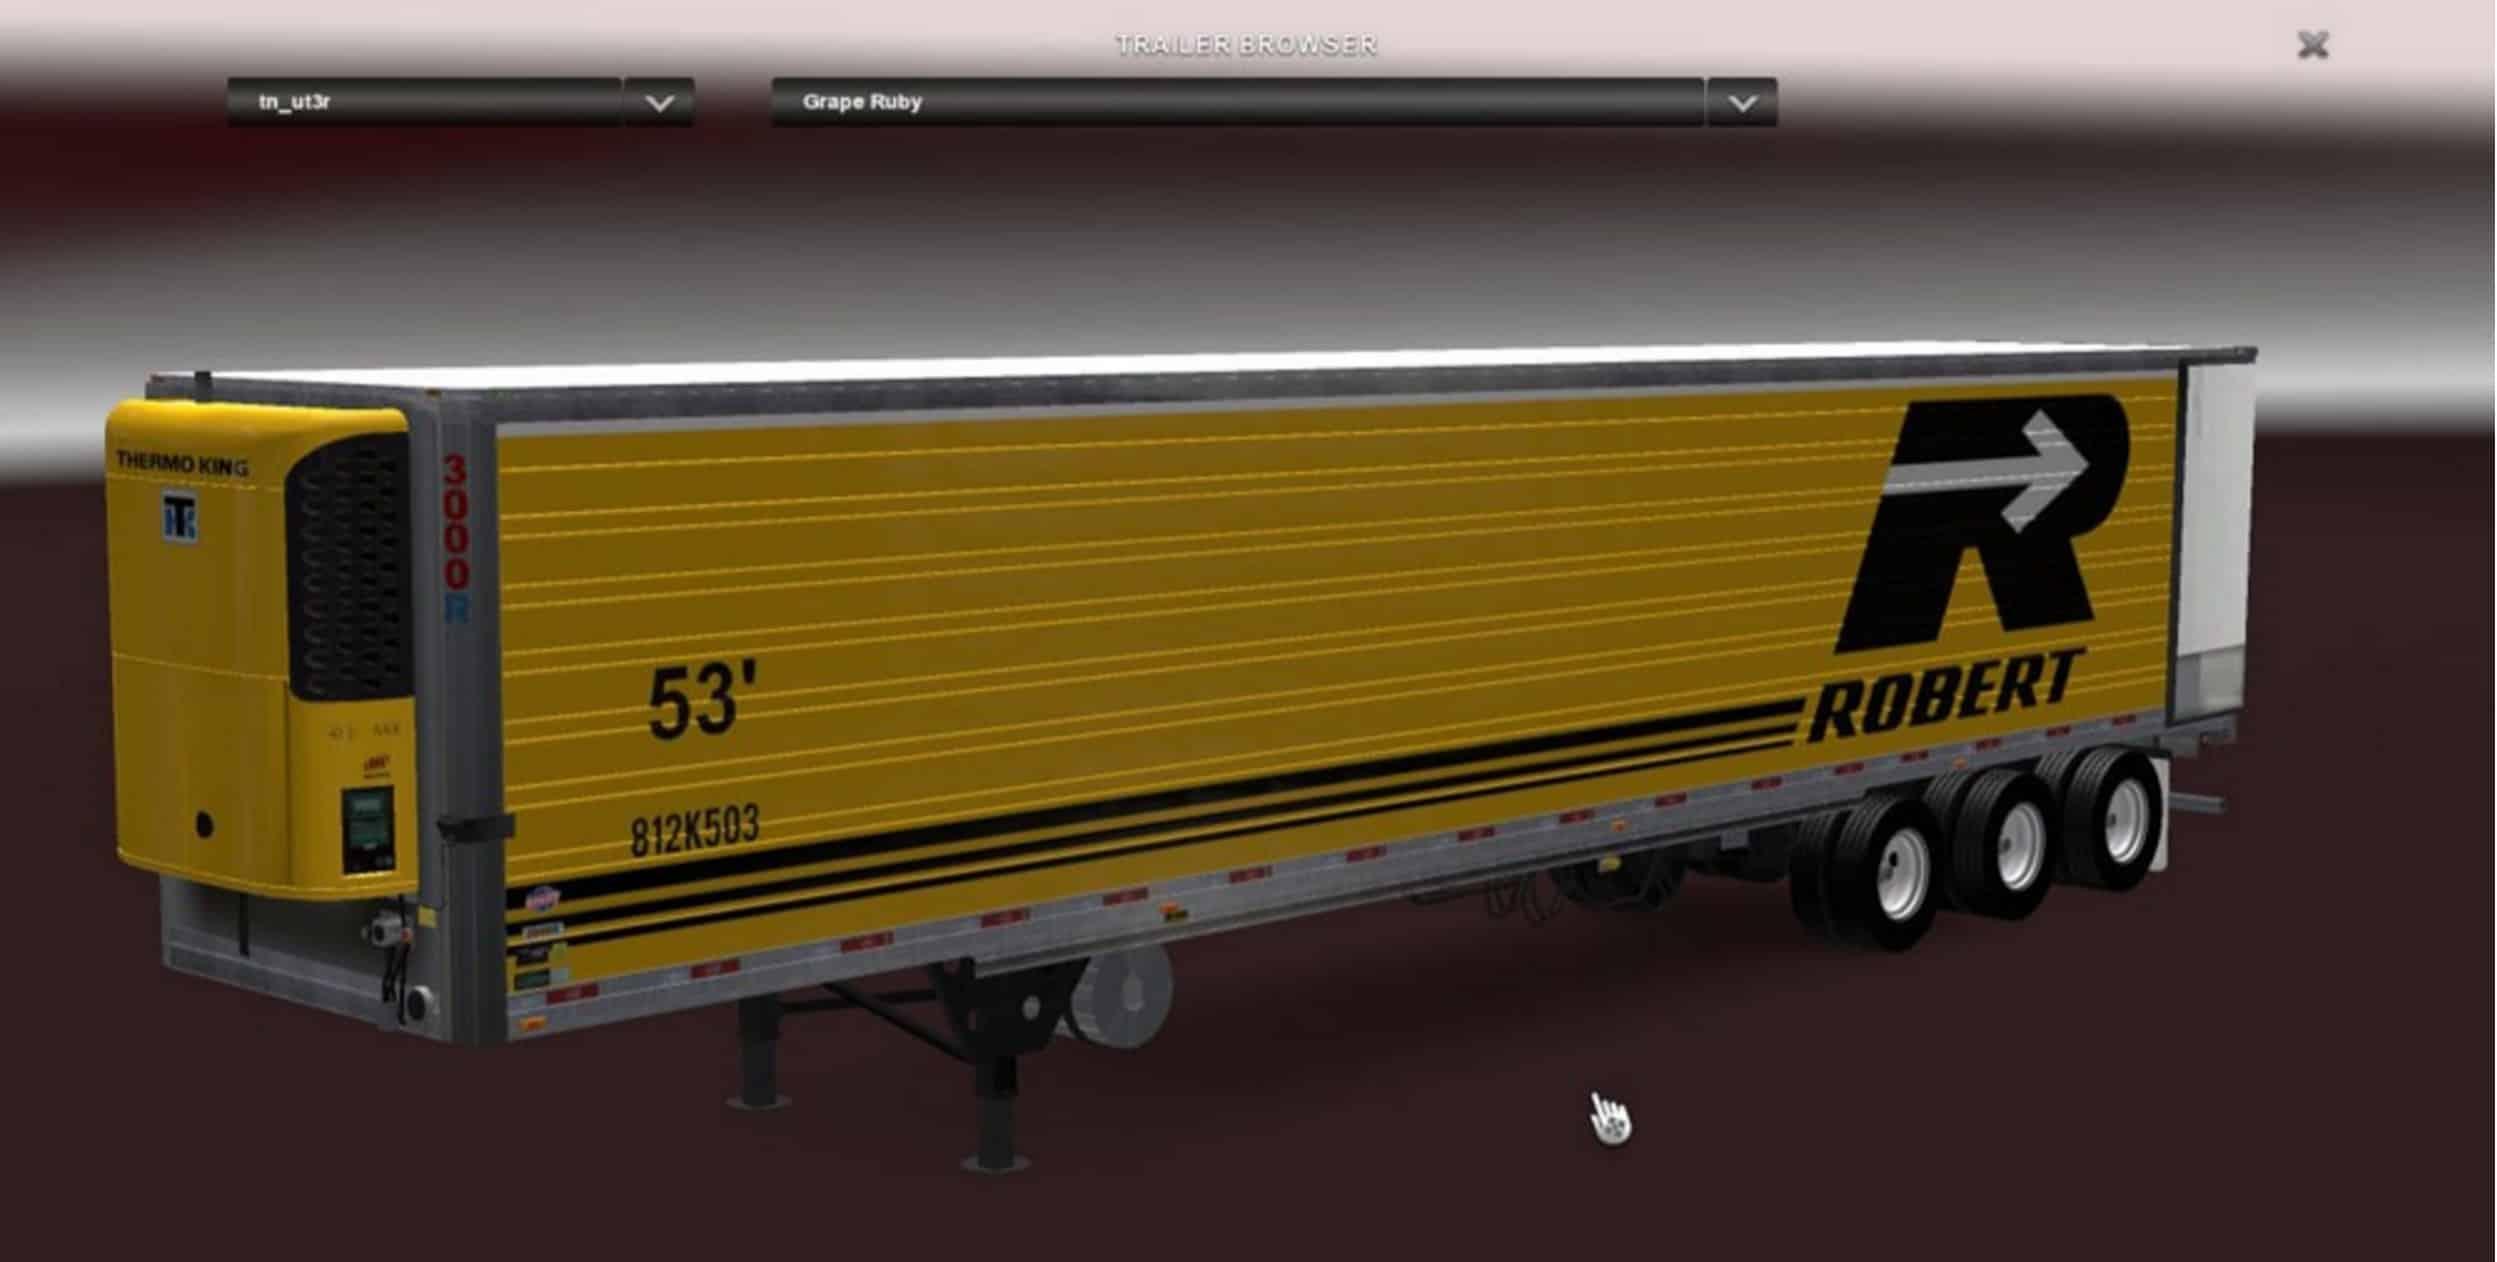 Usa Utility Trailer 3000R v 1 0 Mod - American Truck